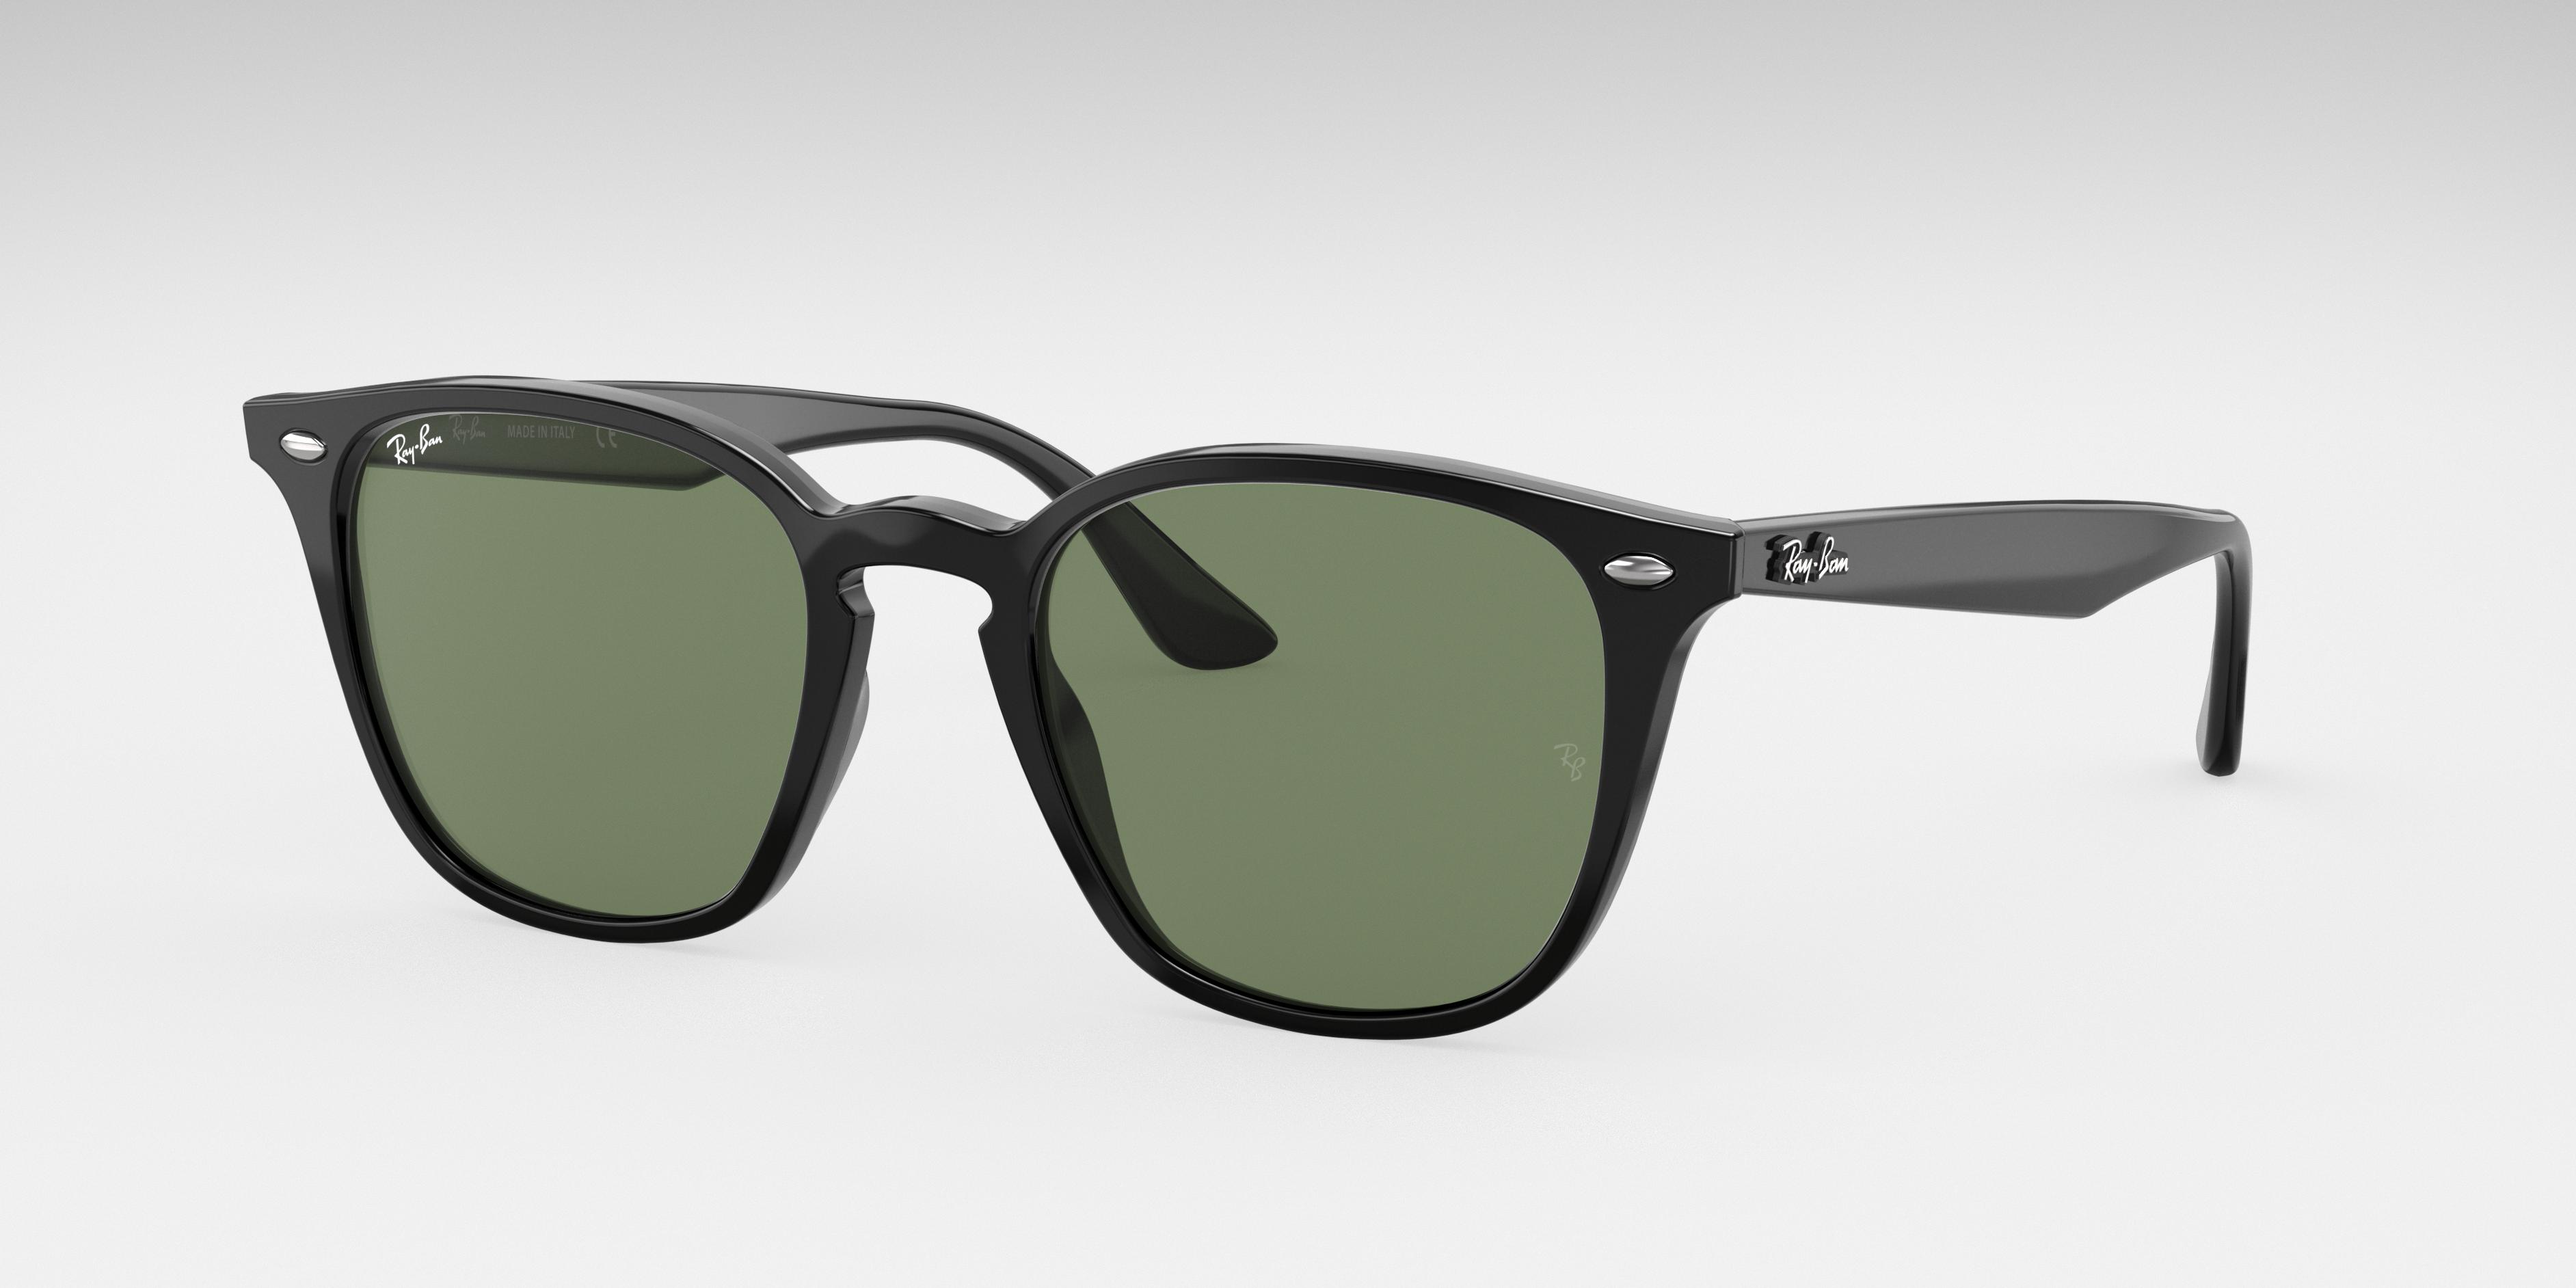 Ray-Ban Rb4258 Black, Green Lenses - RB4258